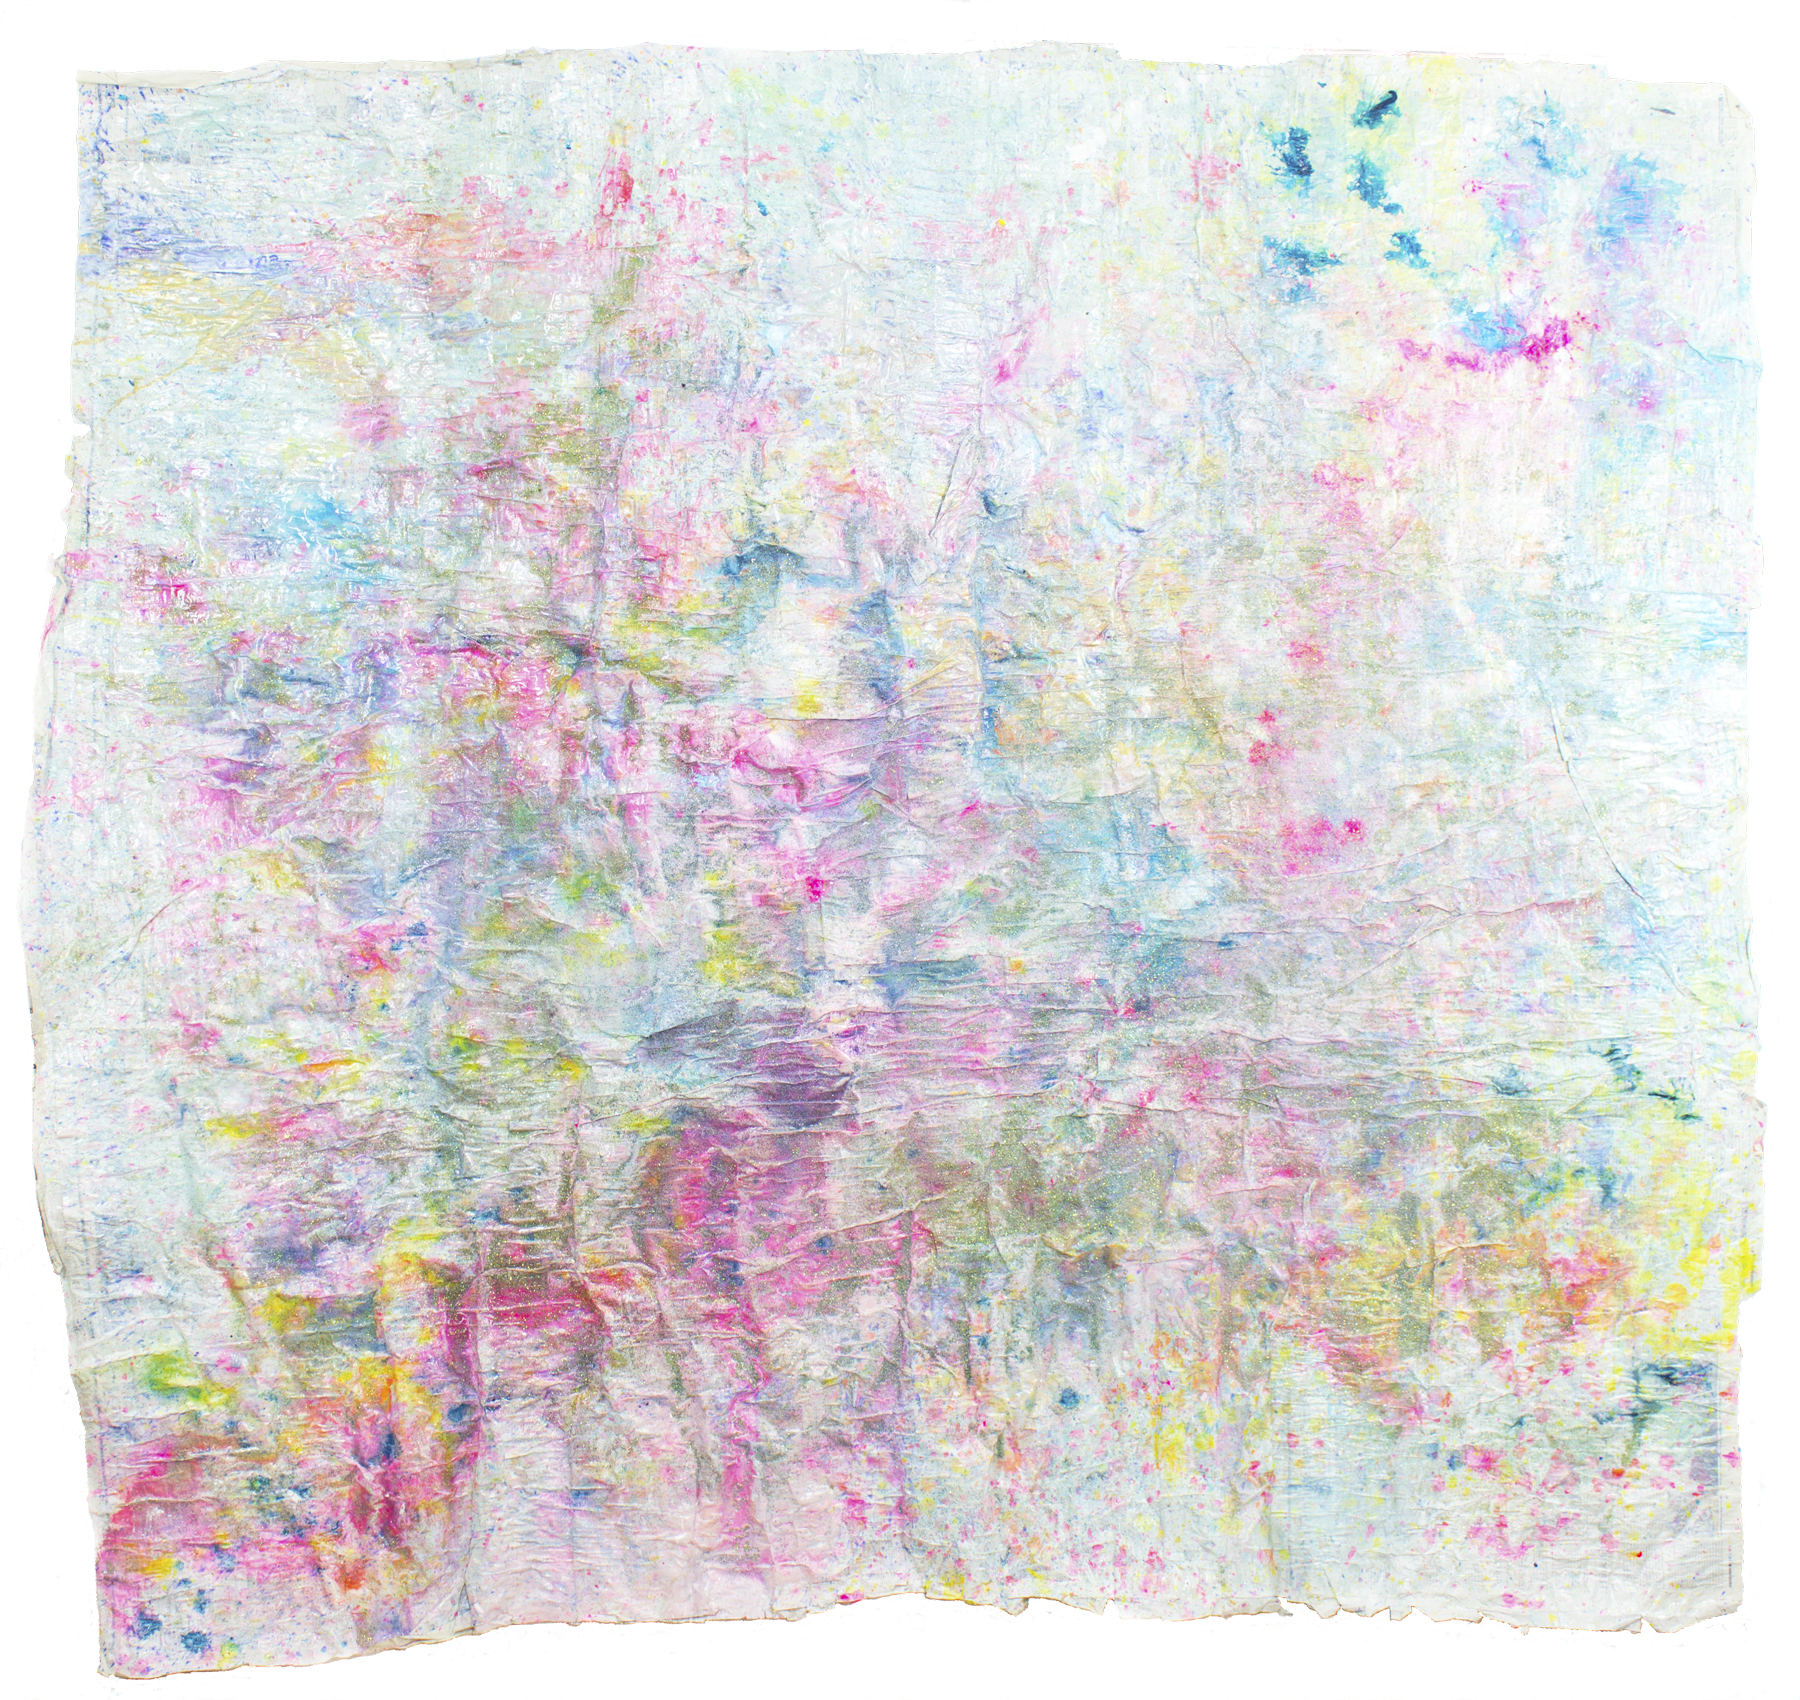 'Sparkling skies NO. 11', 163 x 183 cm, acrylic paint on handmade paper-base, Kerstin Pressler, www.kerstinpressler.com